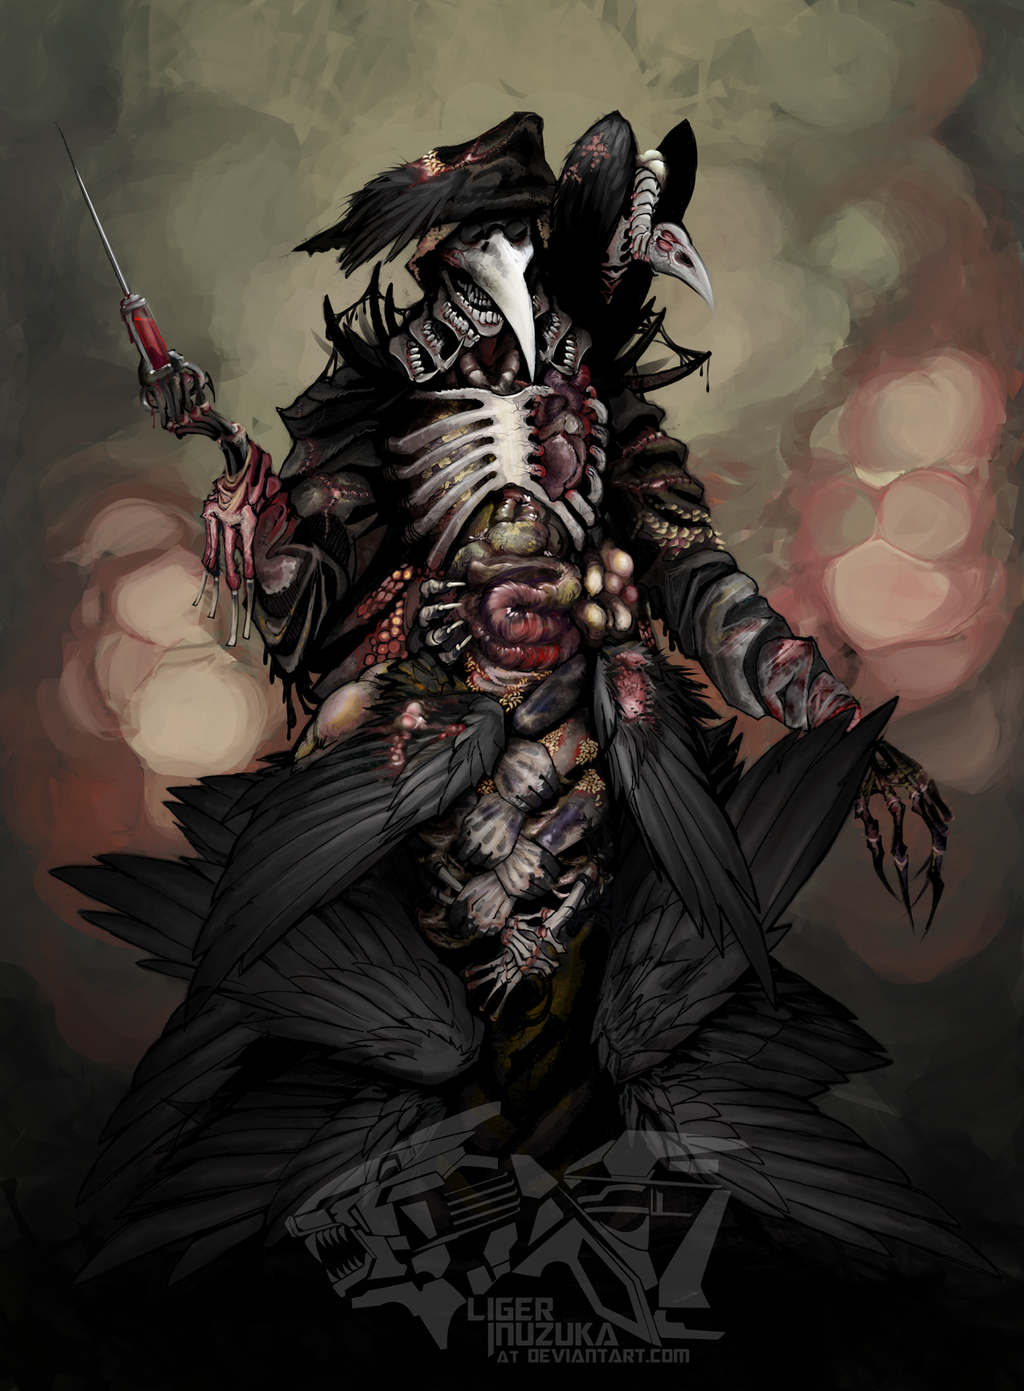 If the Plague was their Child by Liger-Inuzuka